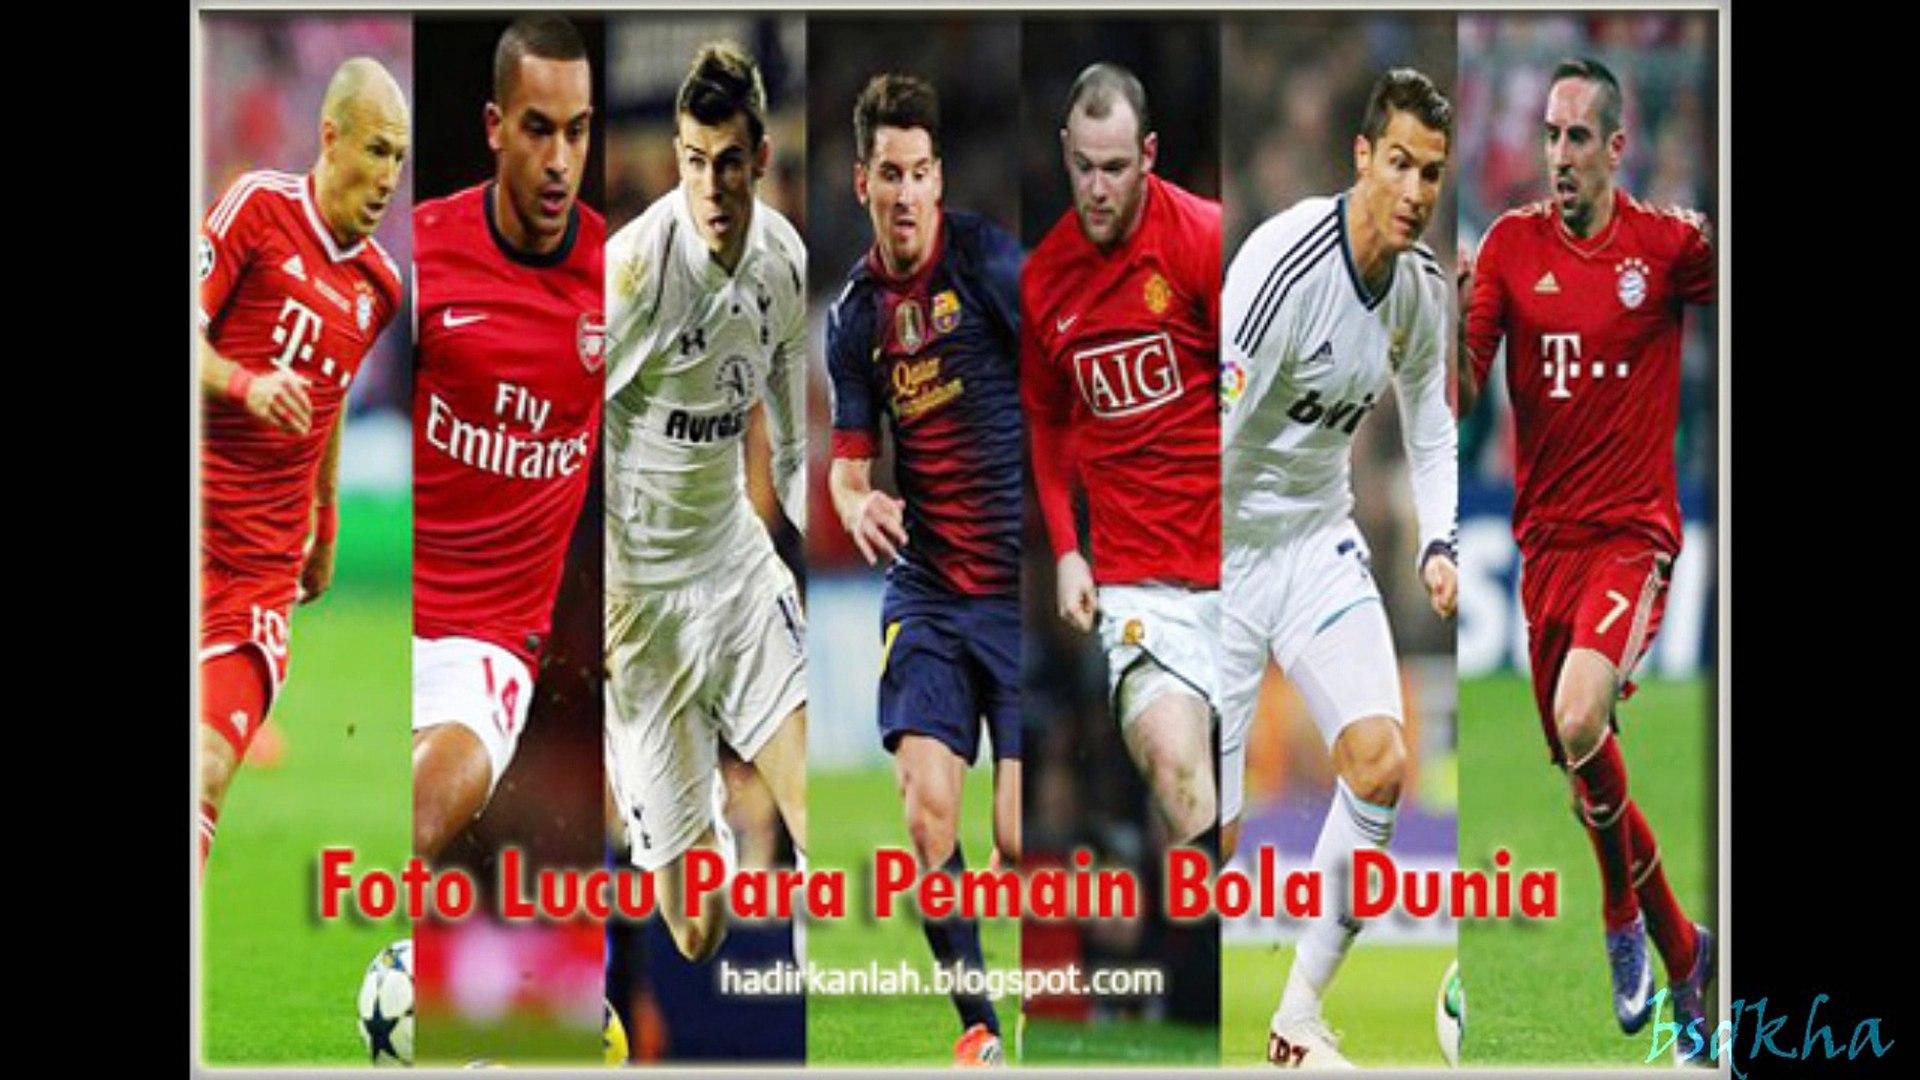 Foto Lucu Para Pemain Top Bola Dunia Video Dailymotion